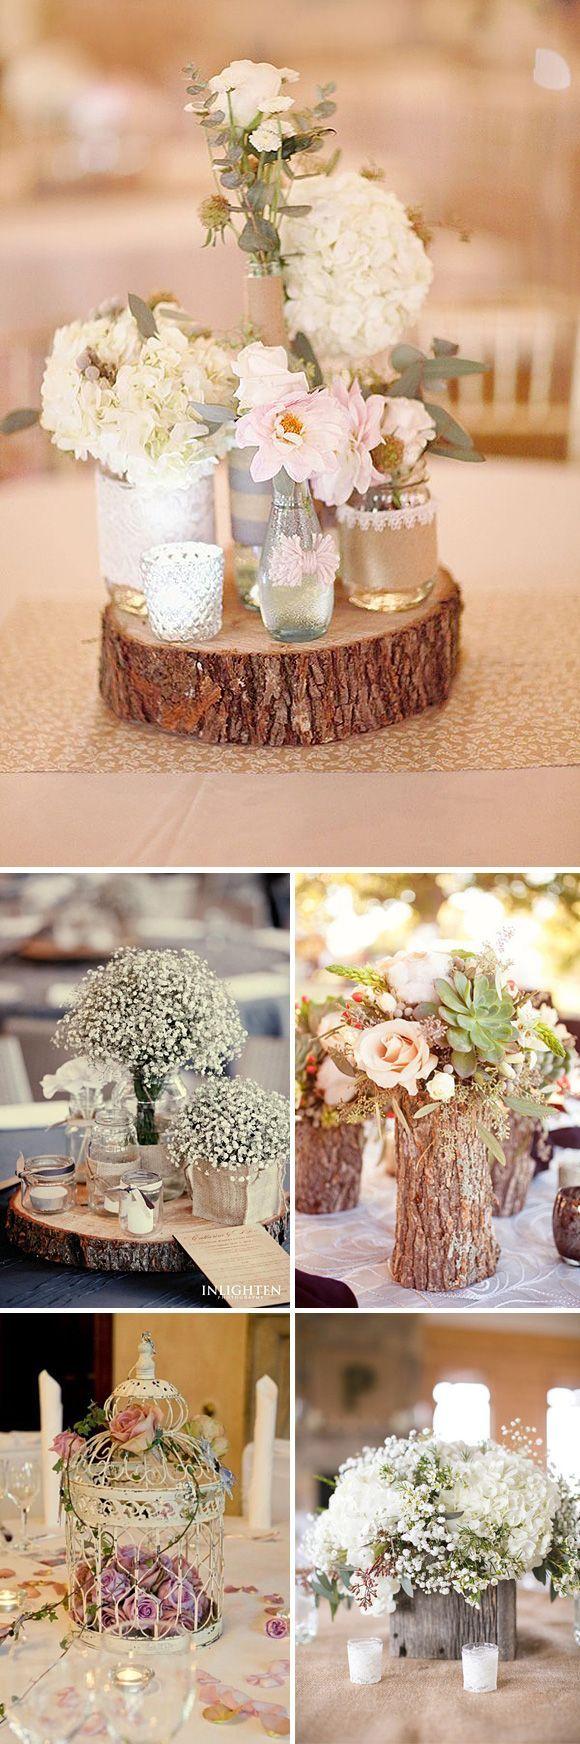 Centros de mesa para bodas rusticas rustic wedding for Decoracion rustica para bodas